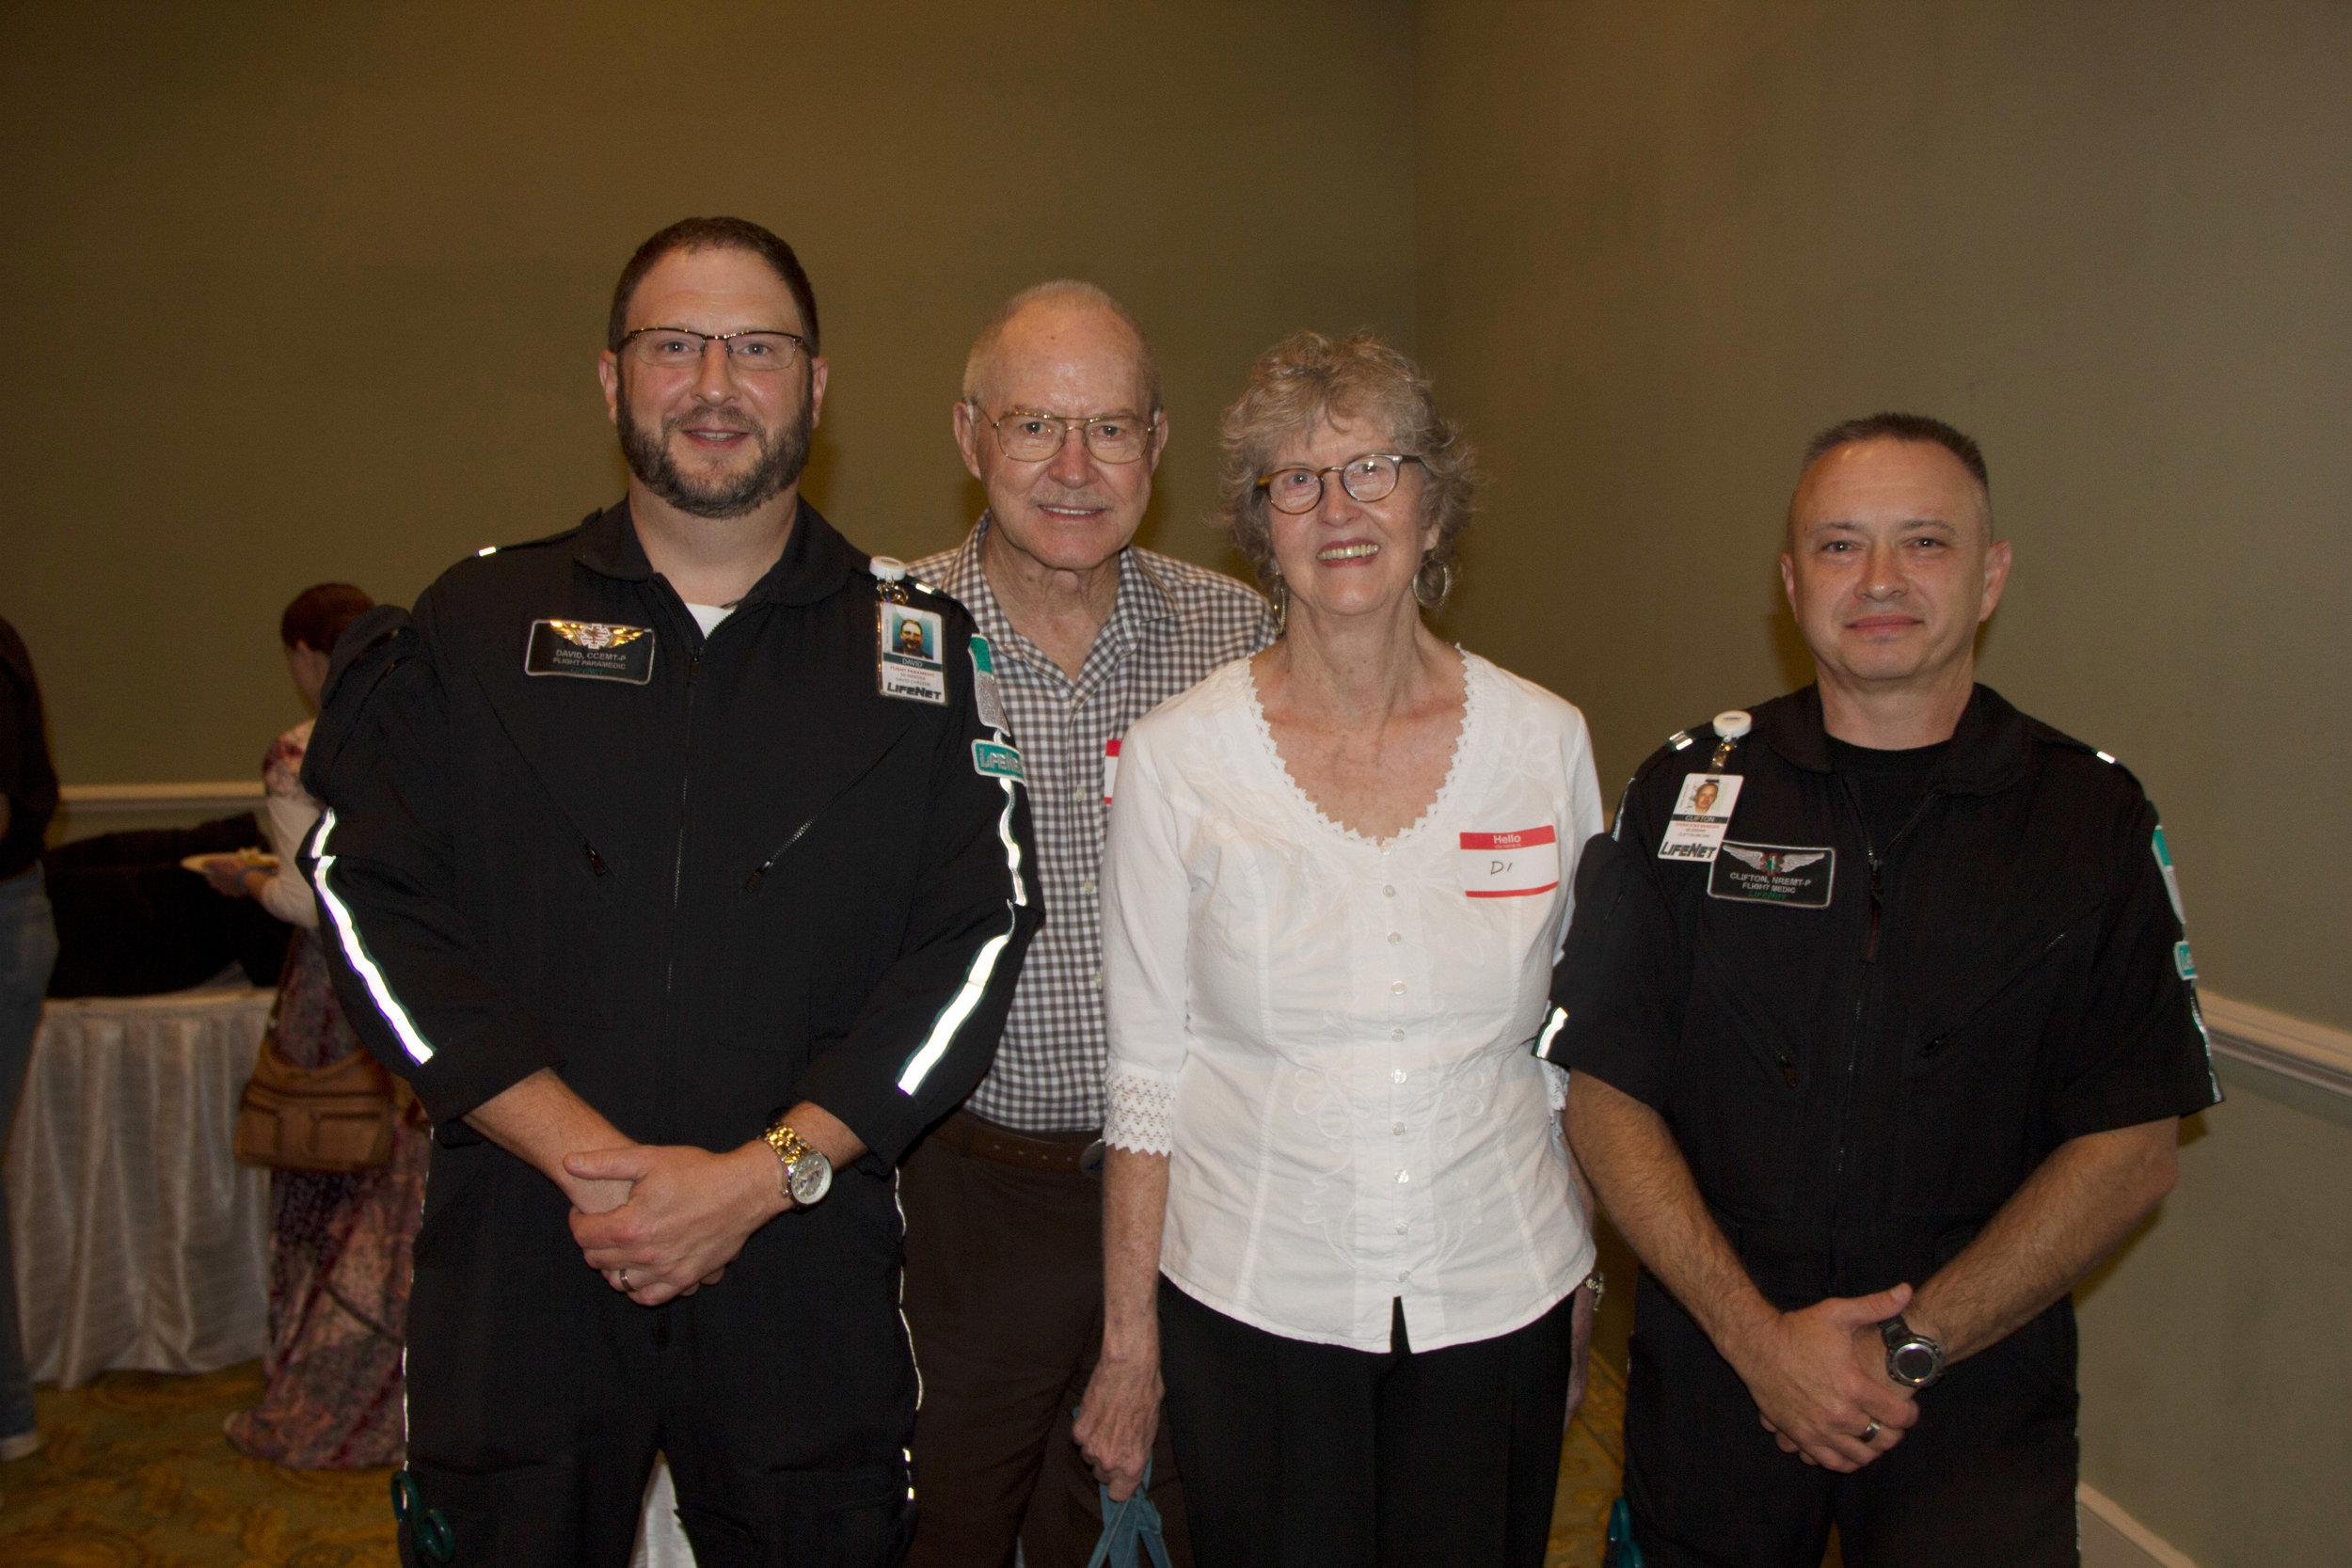 David Chreene, Roy Morgan, Dian Horton and Clifton Brown